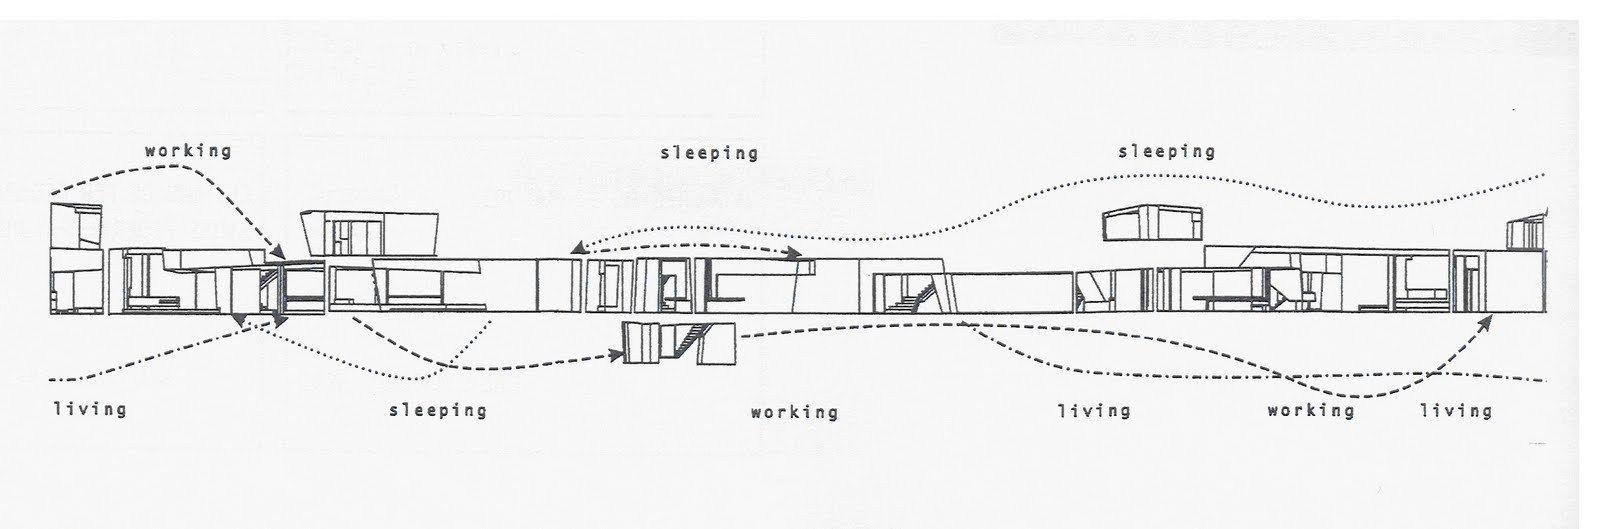 mobius house diagrams | Pinterest | Diagram